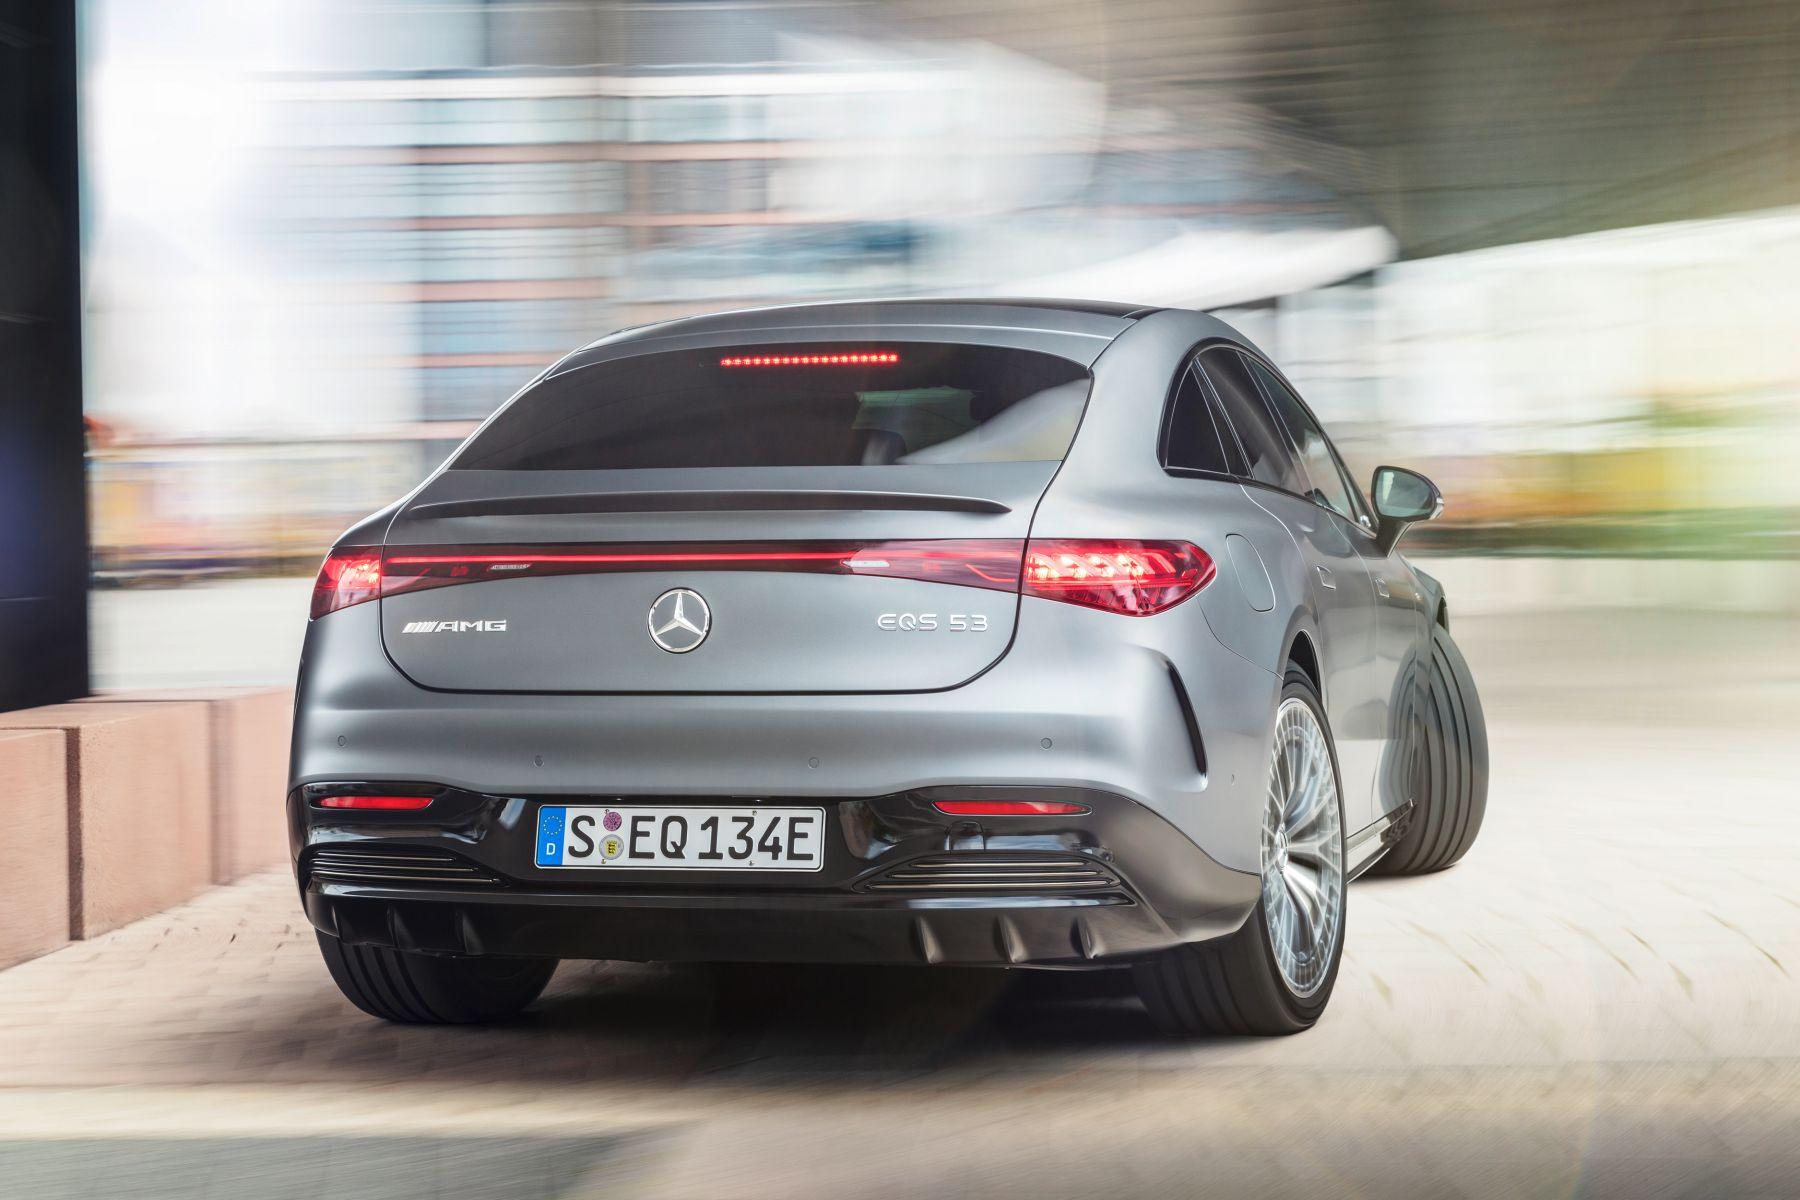 Mercedes AMG EQS 53 Hinterachslenkung